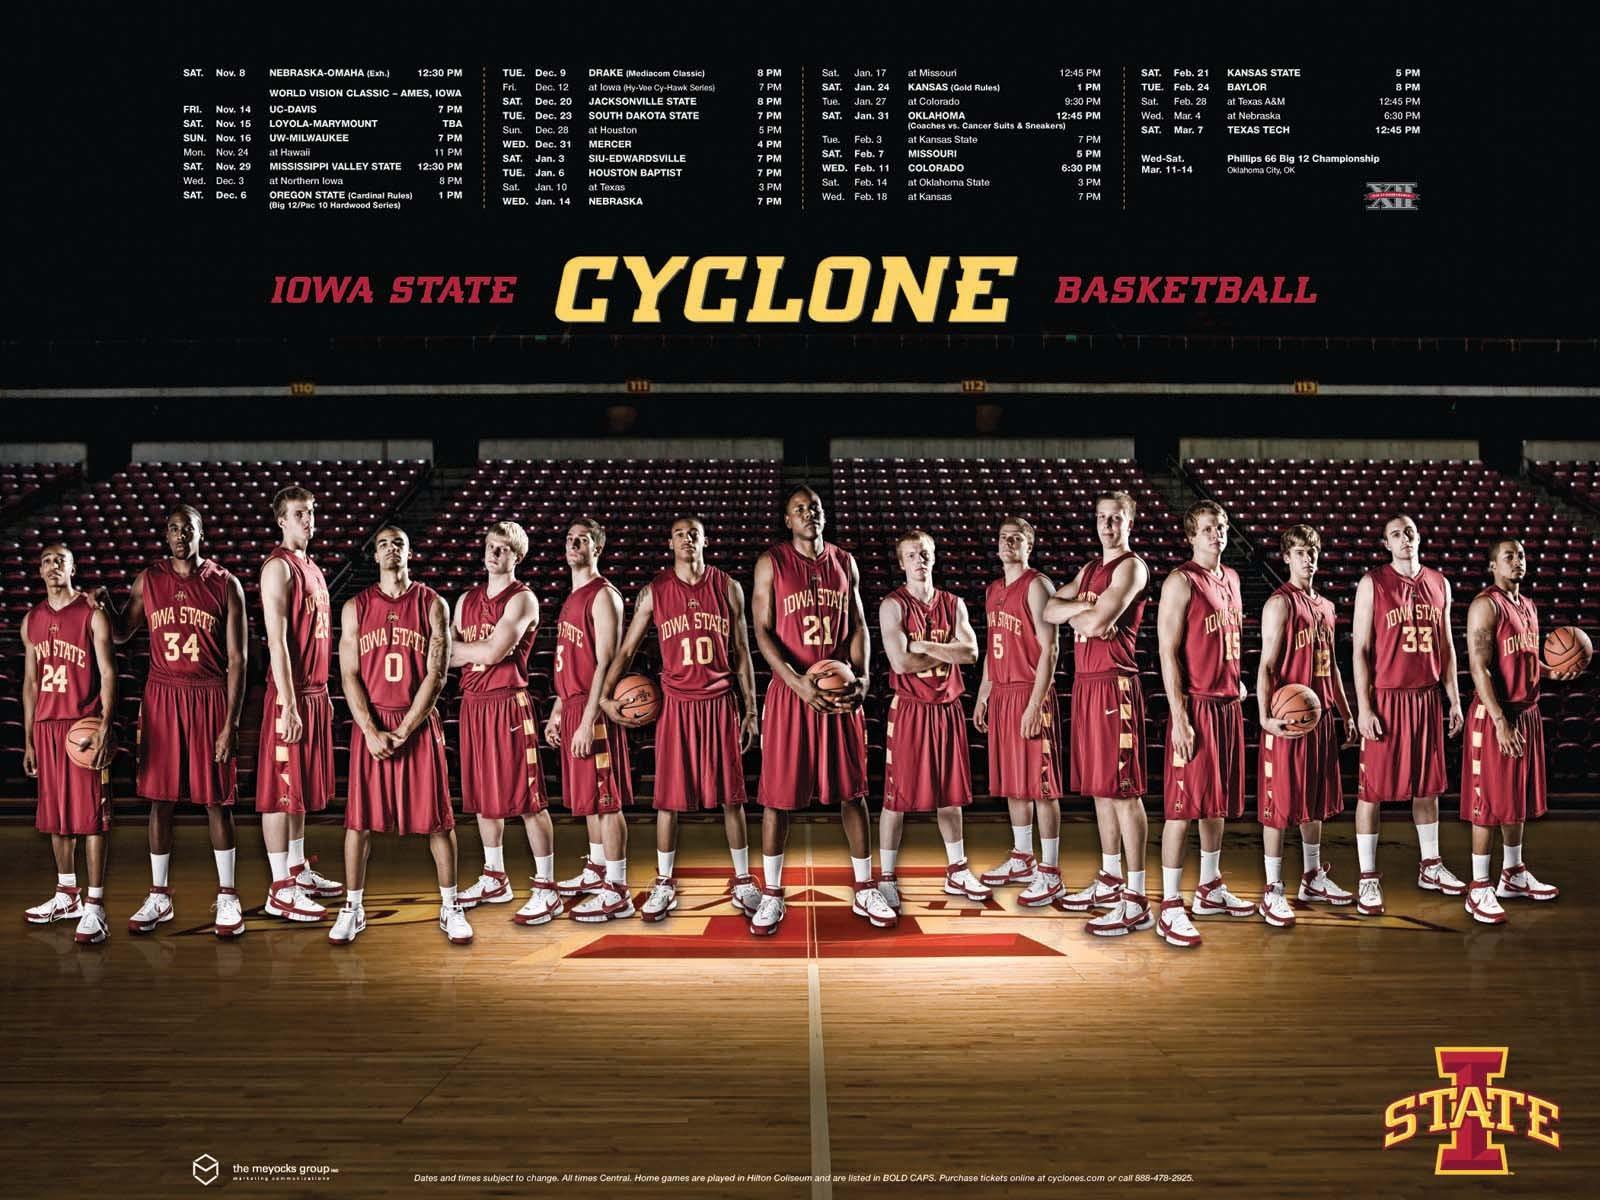 Iowa State Cyclones Basketball Wallpaper 1600x1200